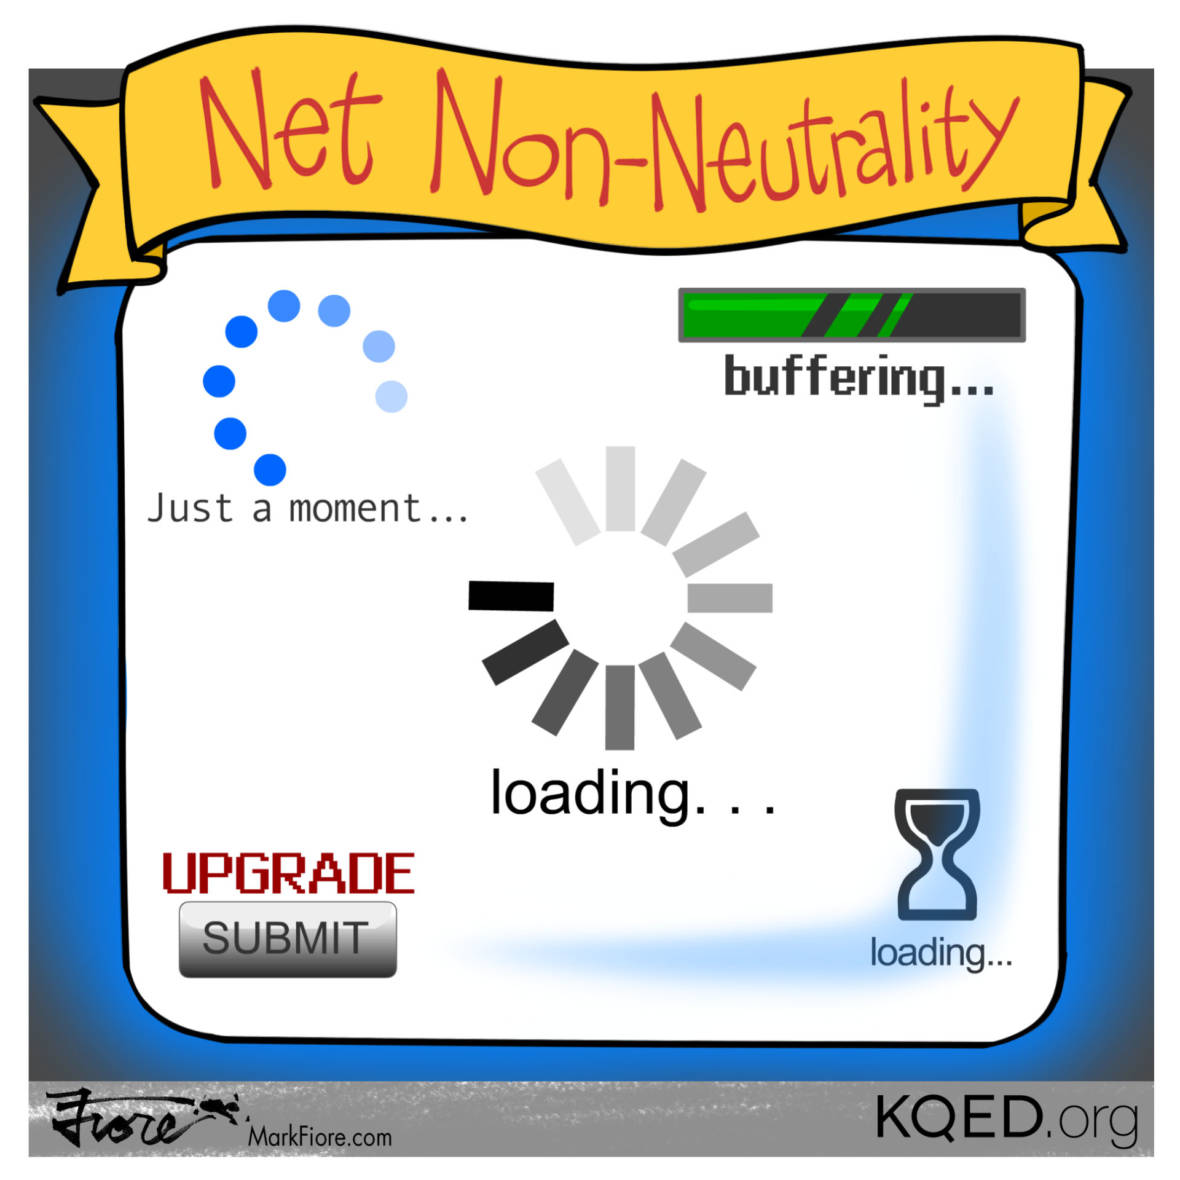 Say Goodbye to Net Neutrality